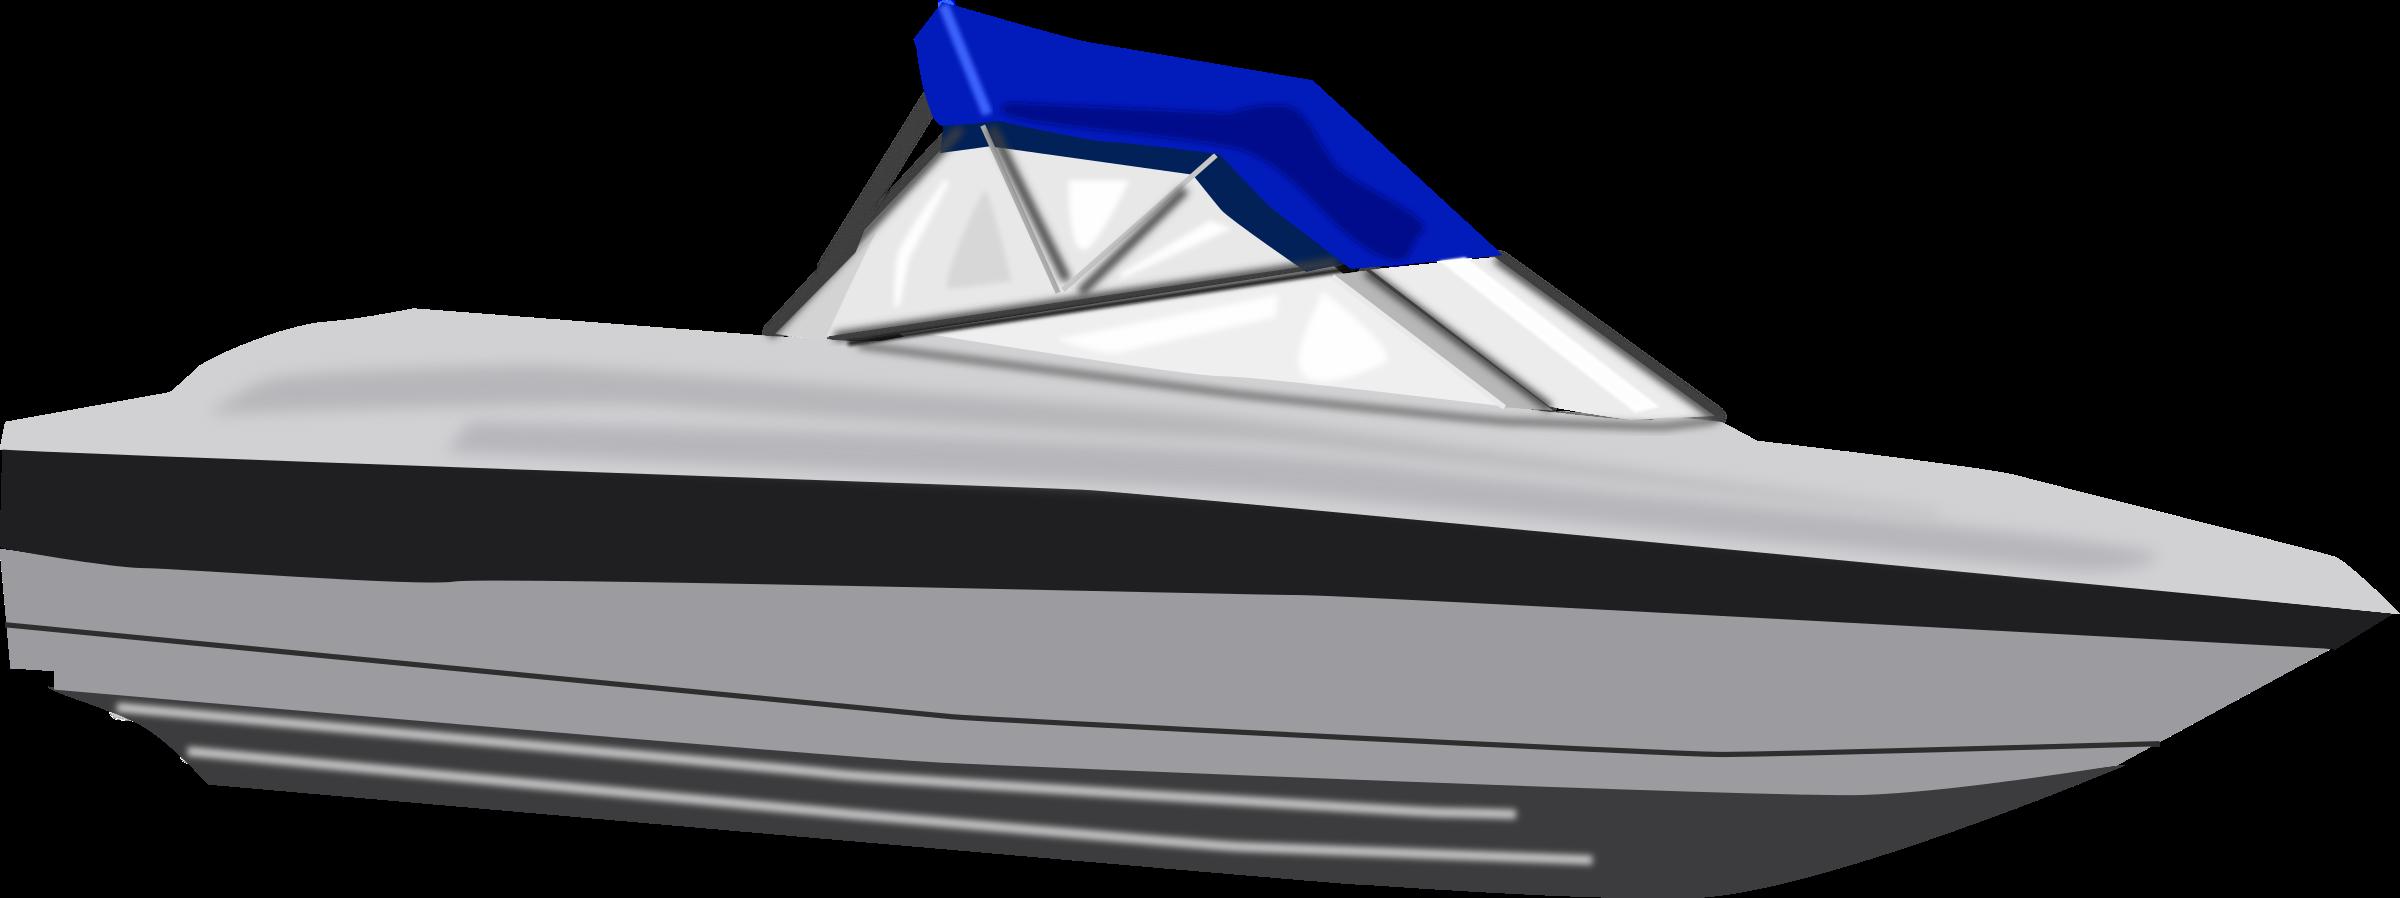 BIG IMAGE  PNG Ski Boat Png